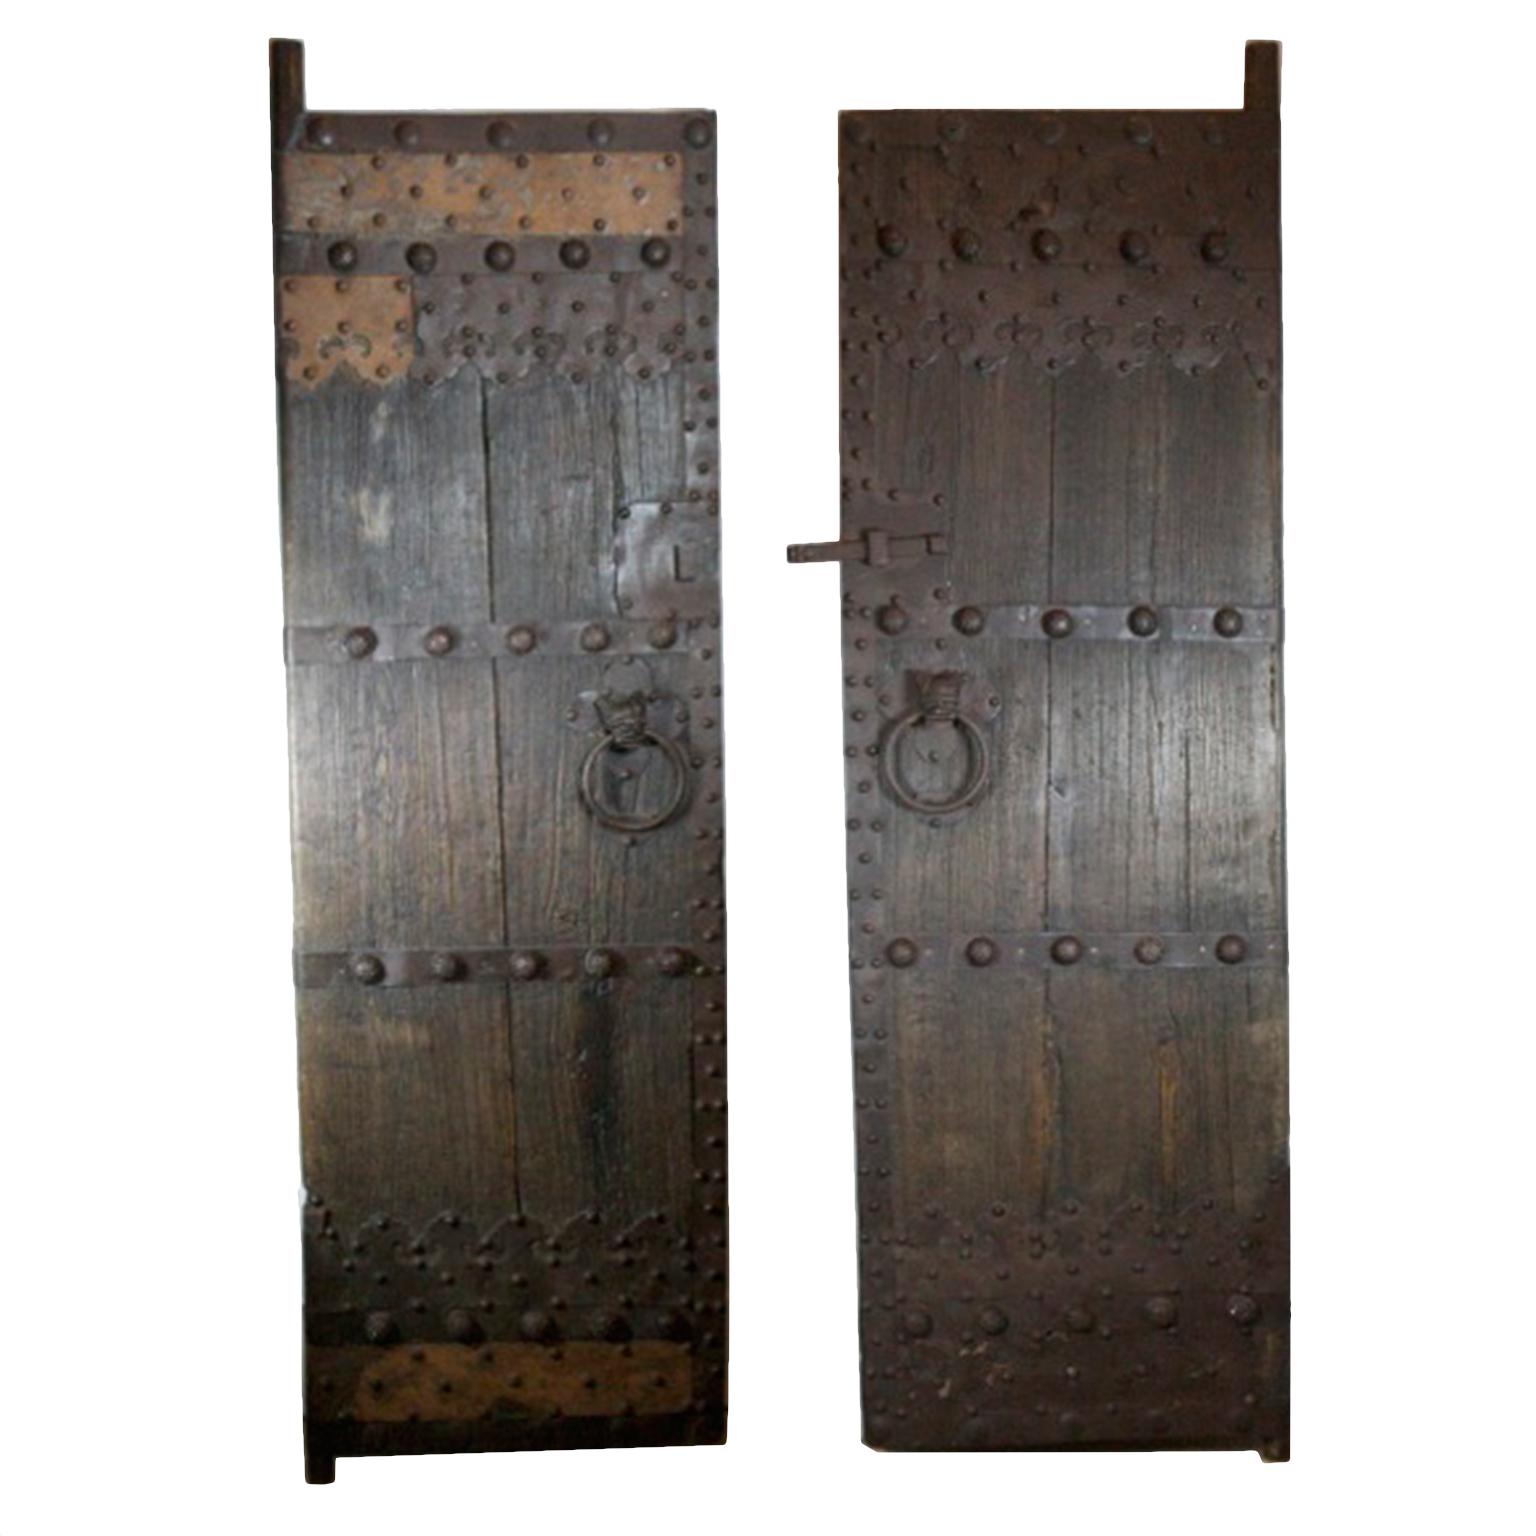 1536 #3B322A Late 19th Century Chinese Garden Gate Doors Pair Chairish wallpaper 3ft French Doors 46651536